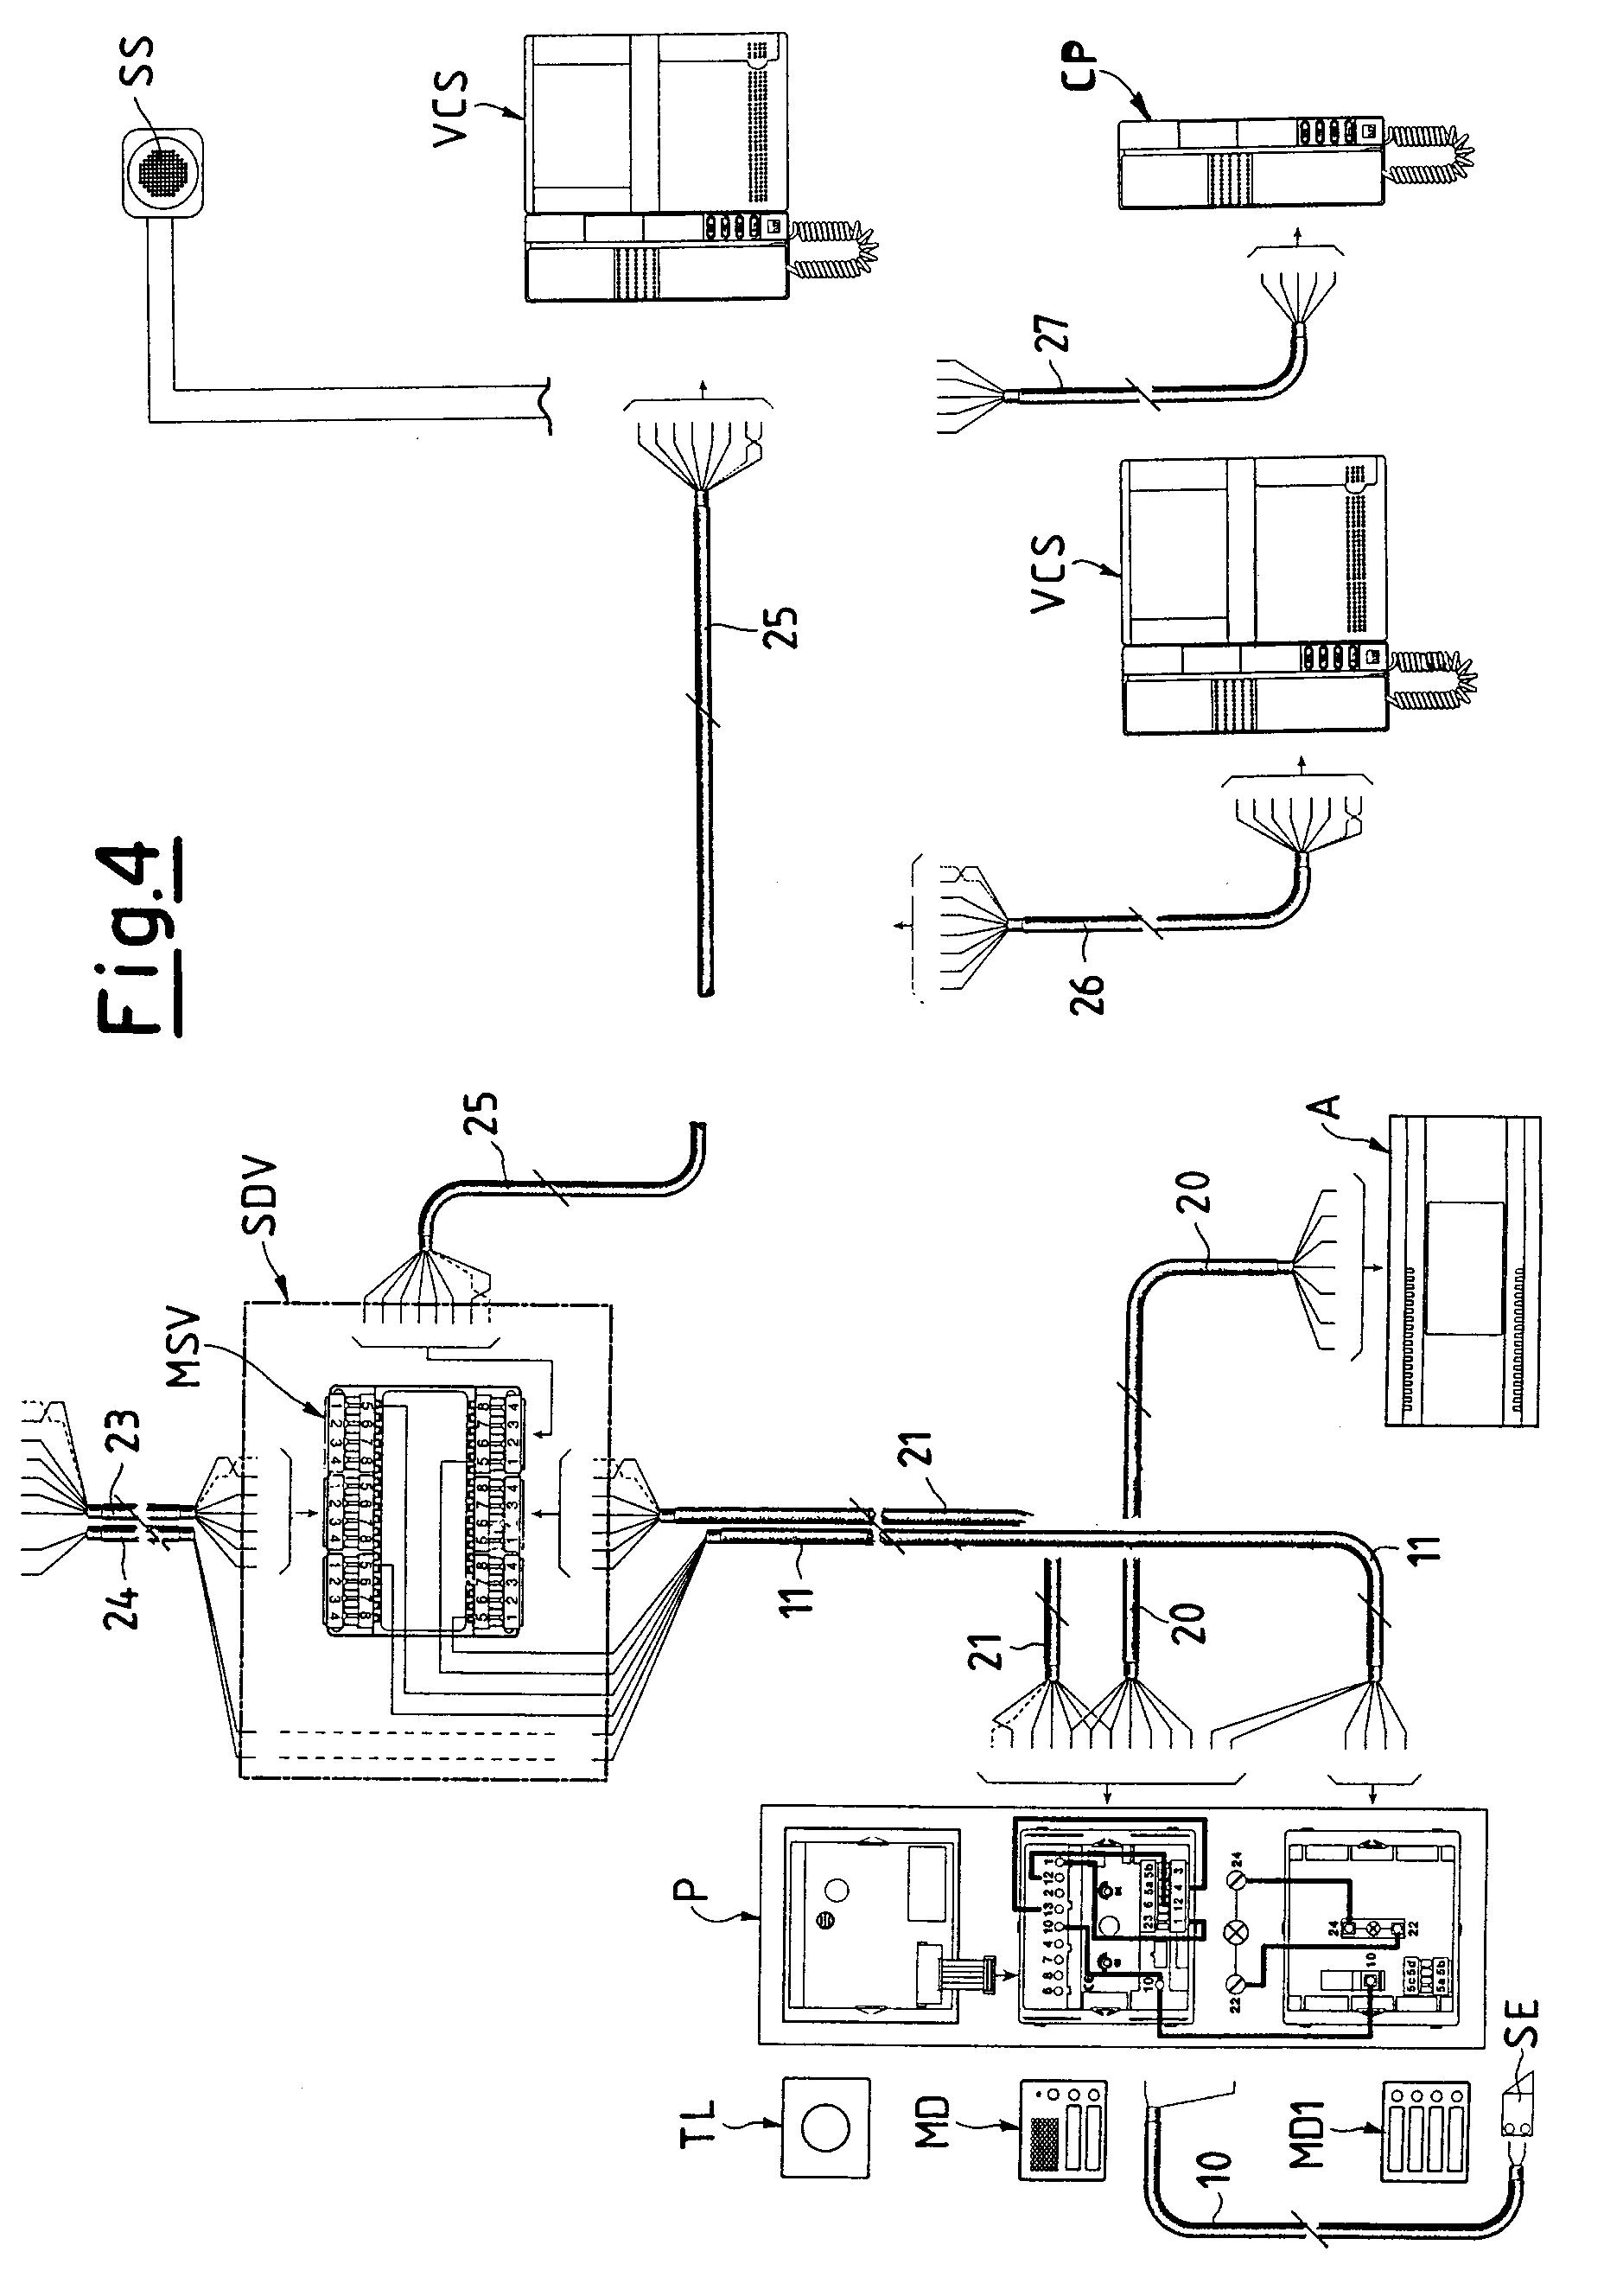 m and s intercom wiring diagrams intercom wiring diagram intercom free wiring diagrams bob melville s farmall wiring diagrams